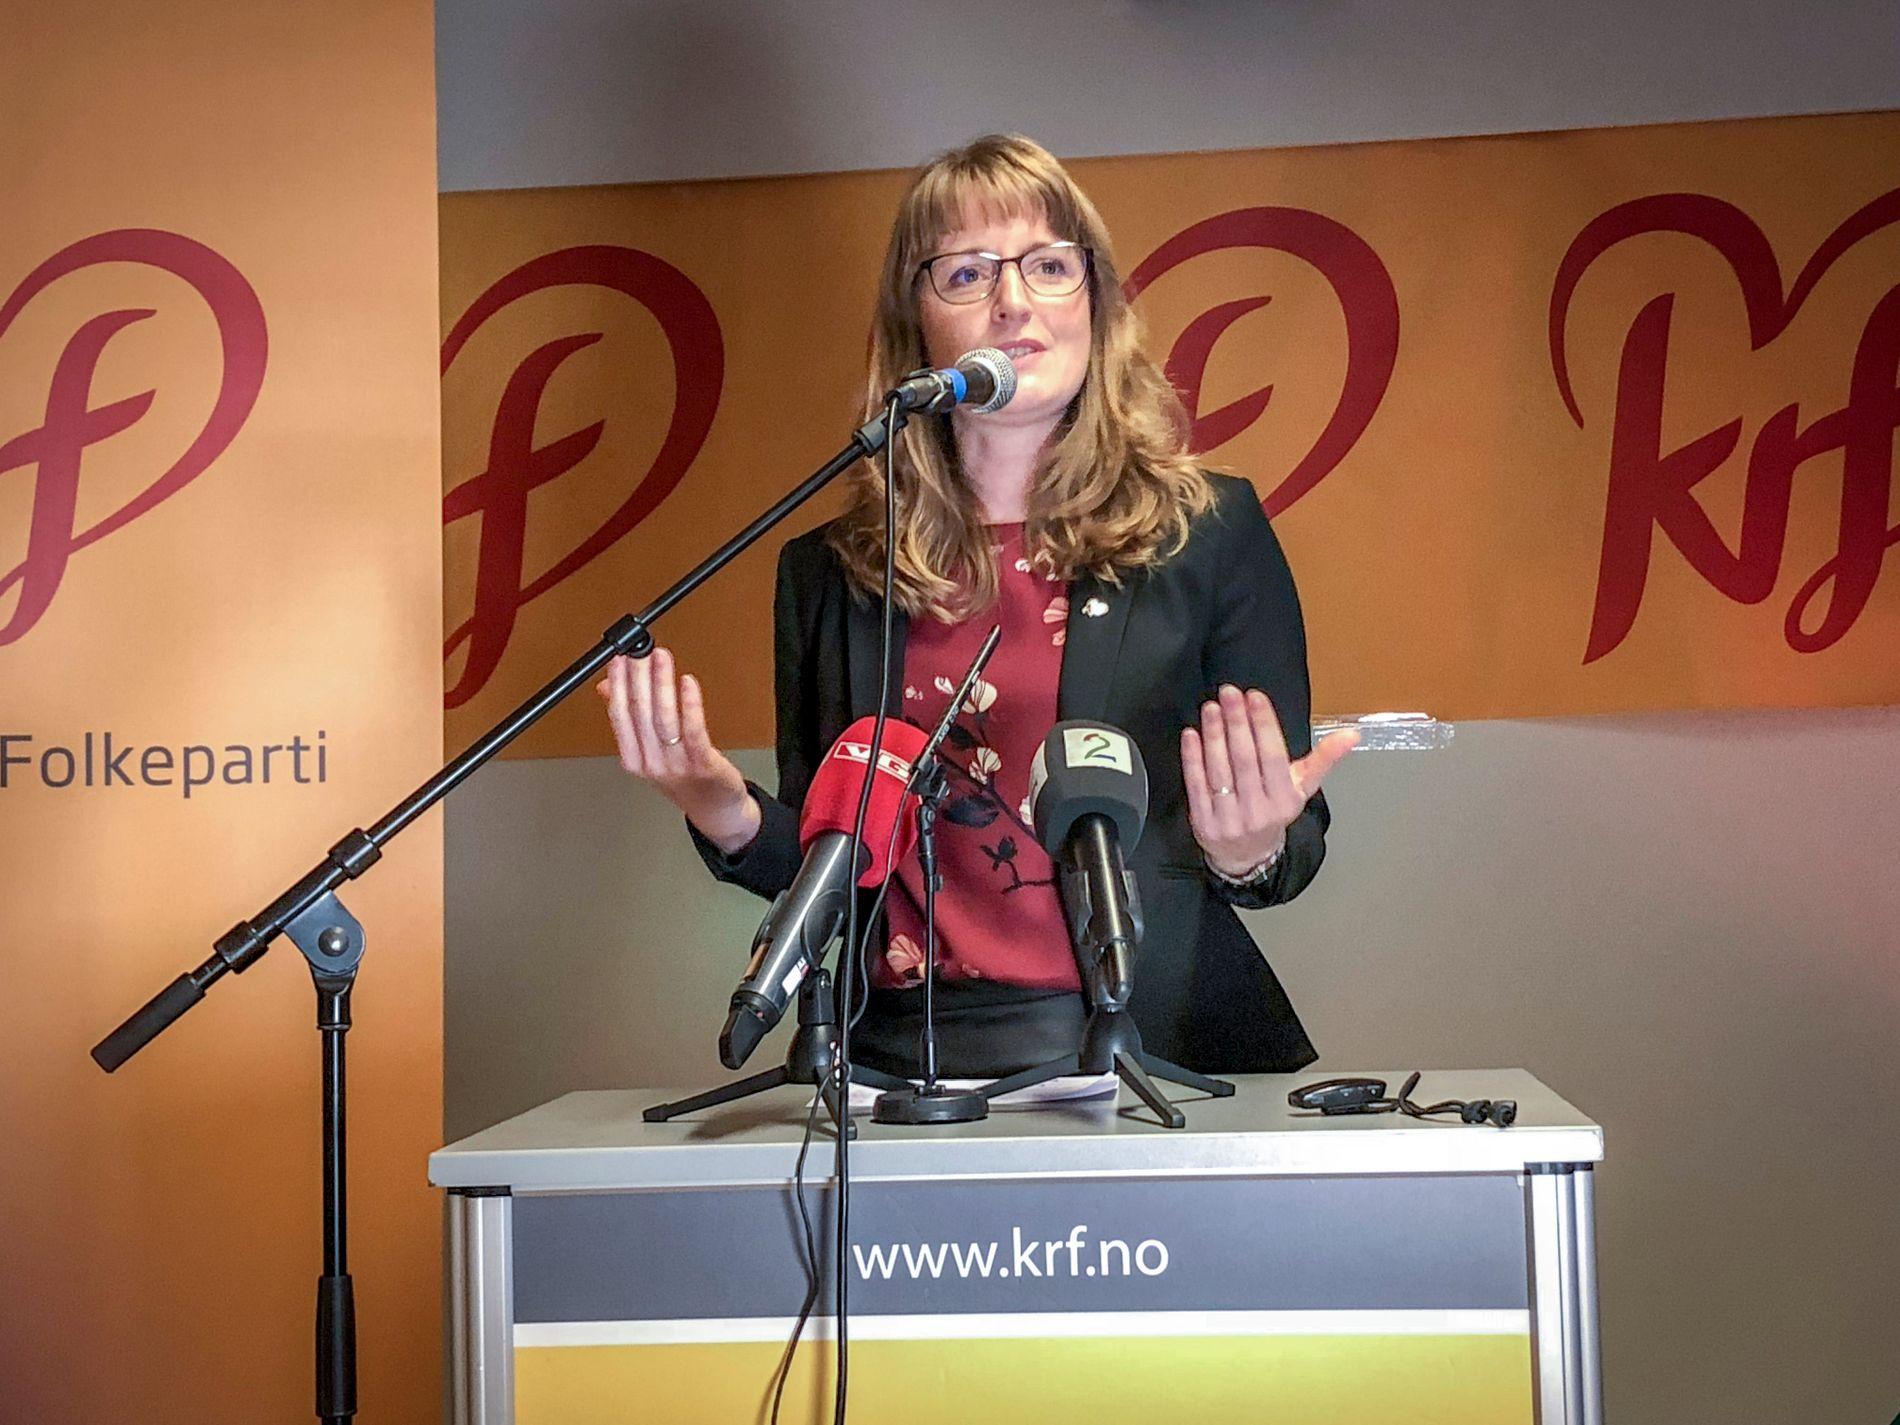 NY NESTLEDER? Fylkesleder i Nordland KrF, Ingelin Noresjø frykter KrF svekkes i distrikter der flertallet er «røde».